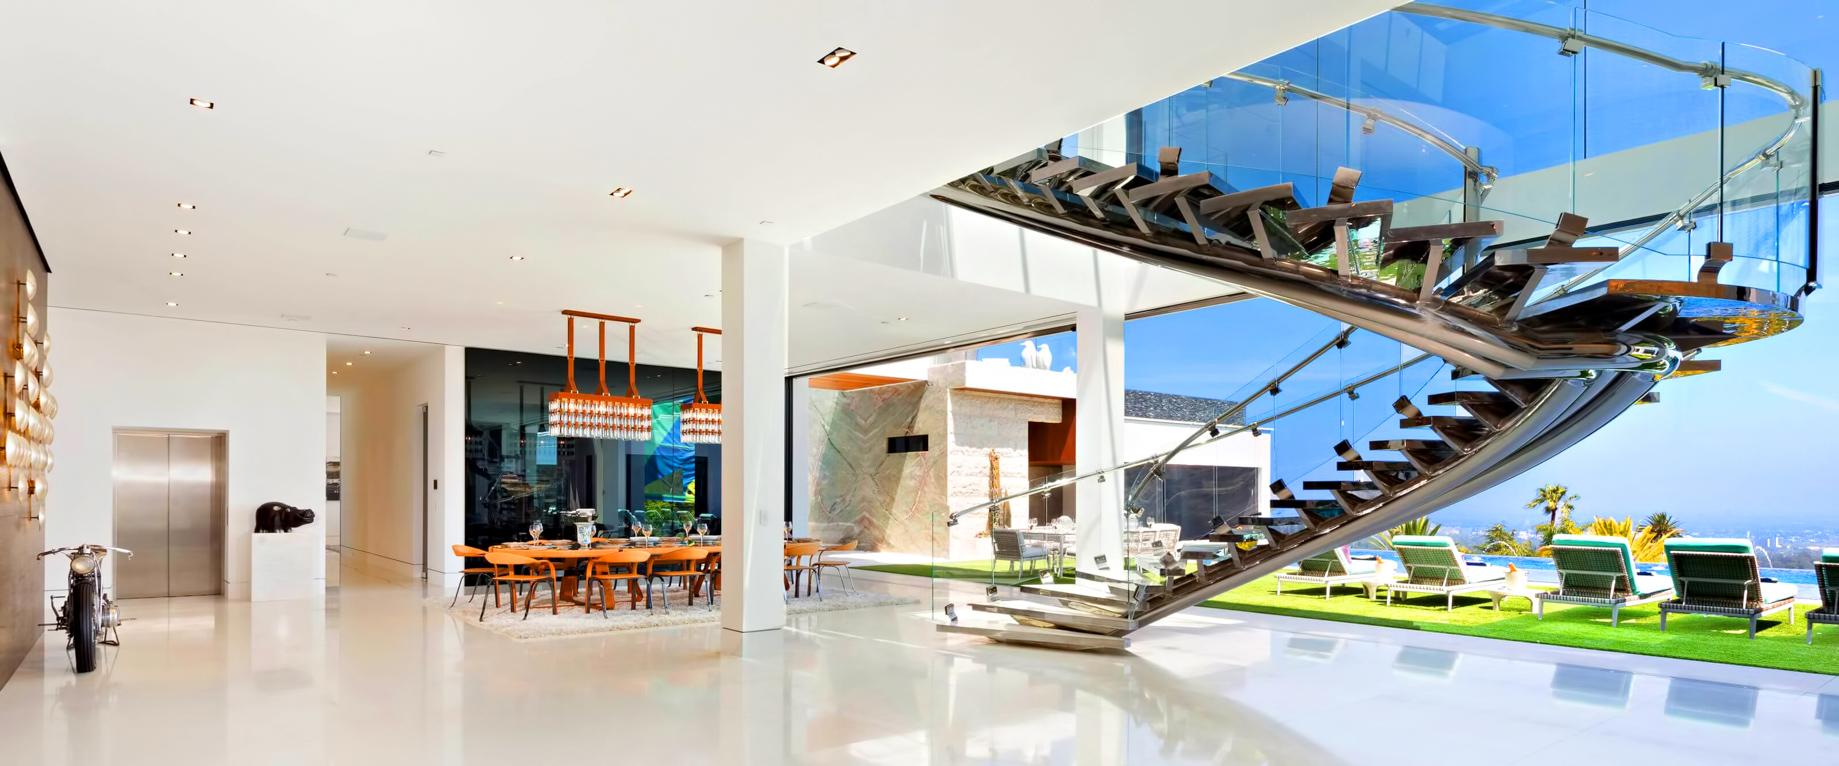 Luxury Residence – 924 Bel Air Rd, Los Angeles, CA, USA